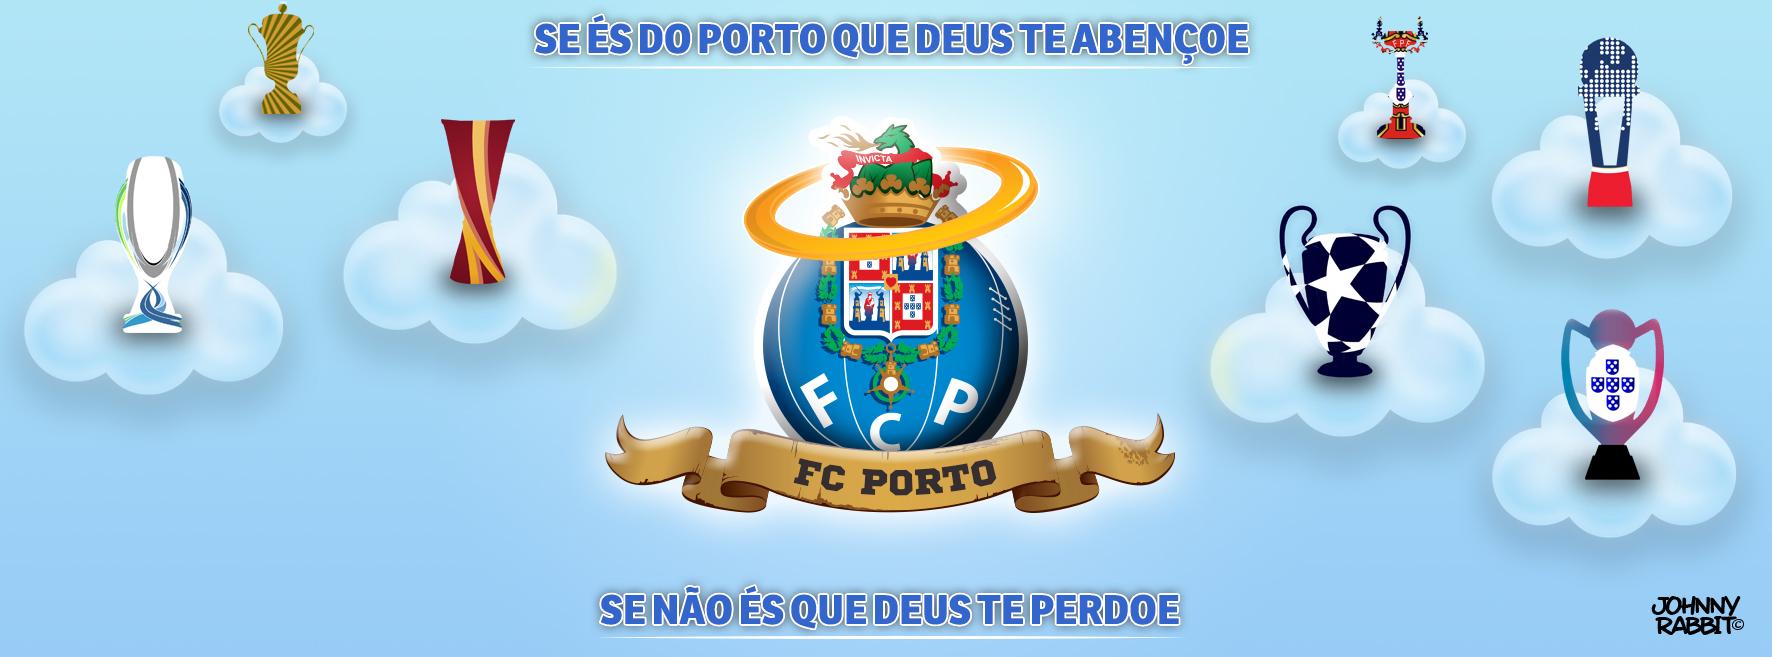 Deus Te Abençoe: FC Porto By Joaoc23 On DeviantArt